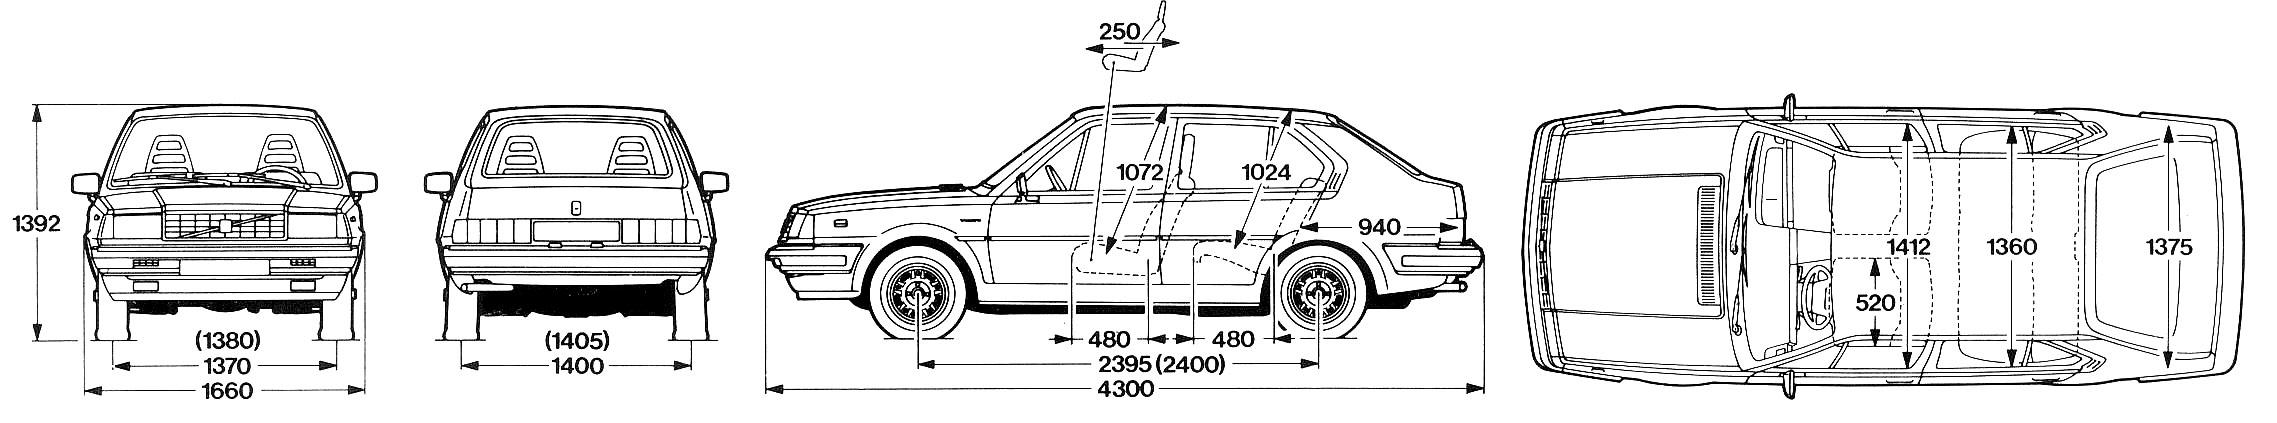 Volvo 345 blueprint